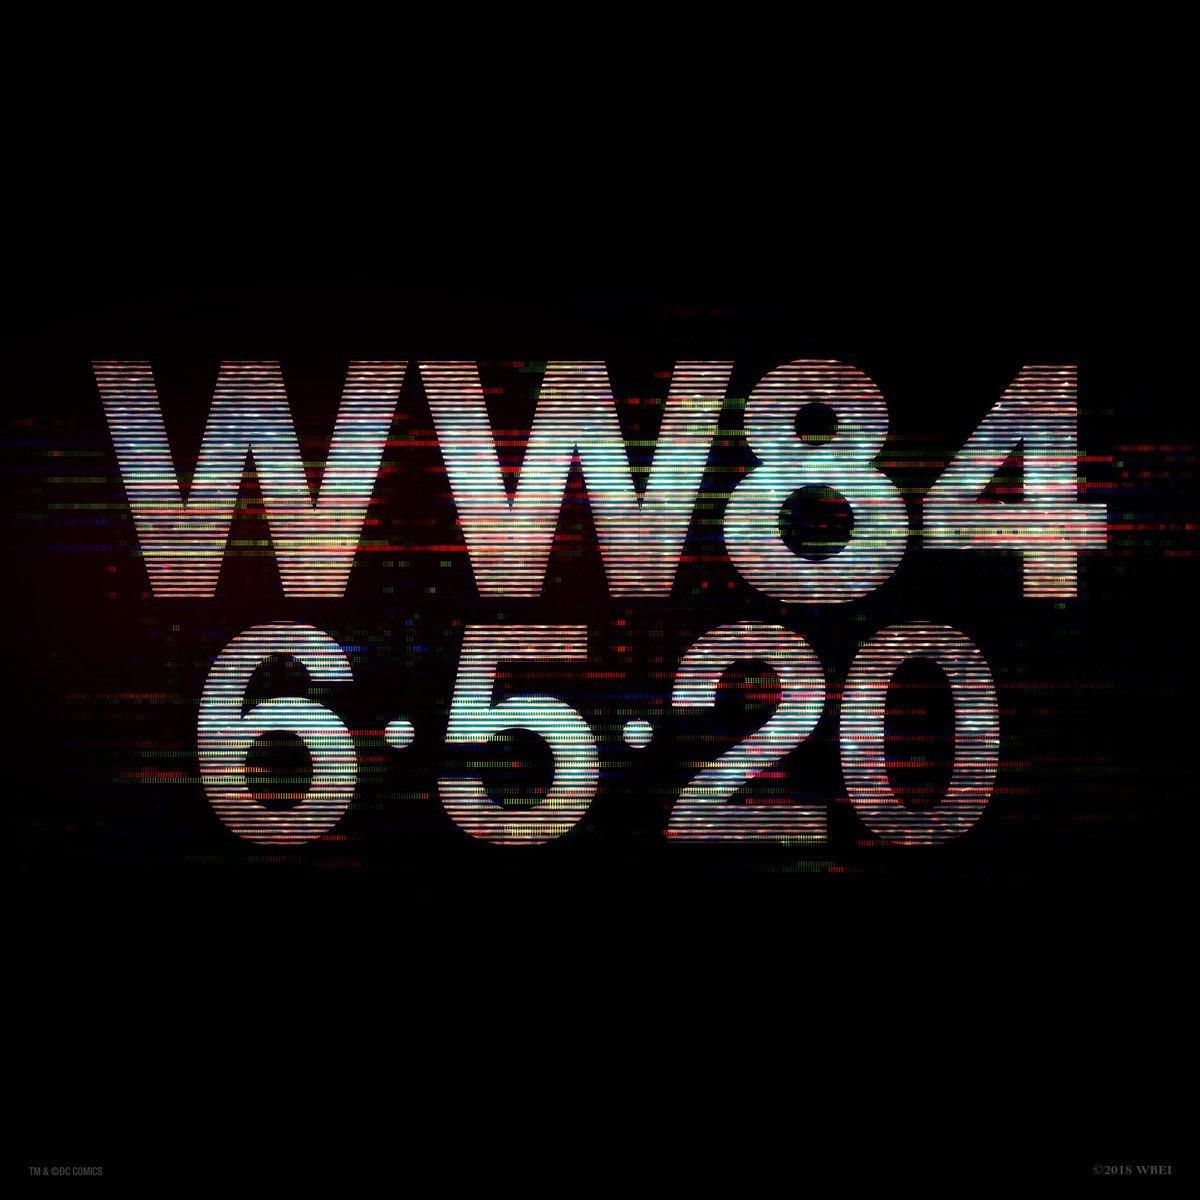 Wonder Woman 1984 has been pushed back to June 5, 2020 💫 (via @GalGadot)